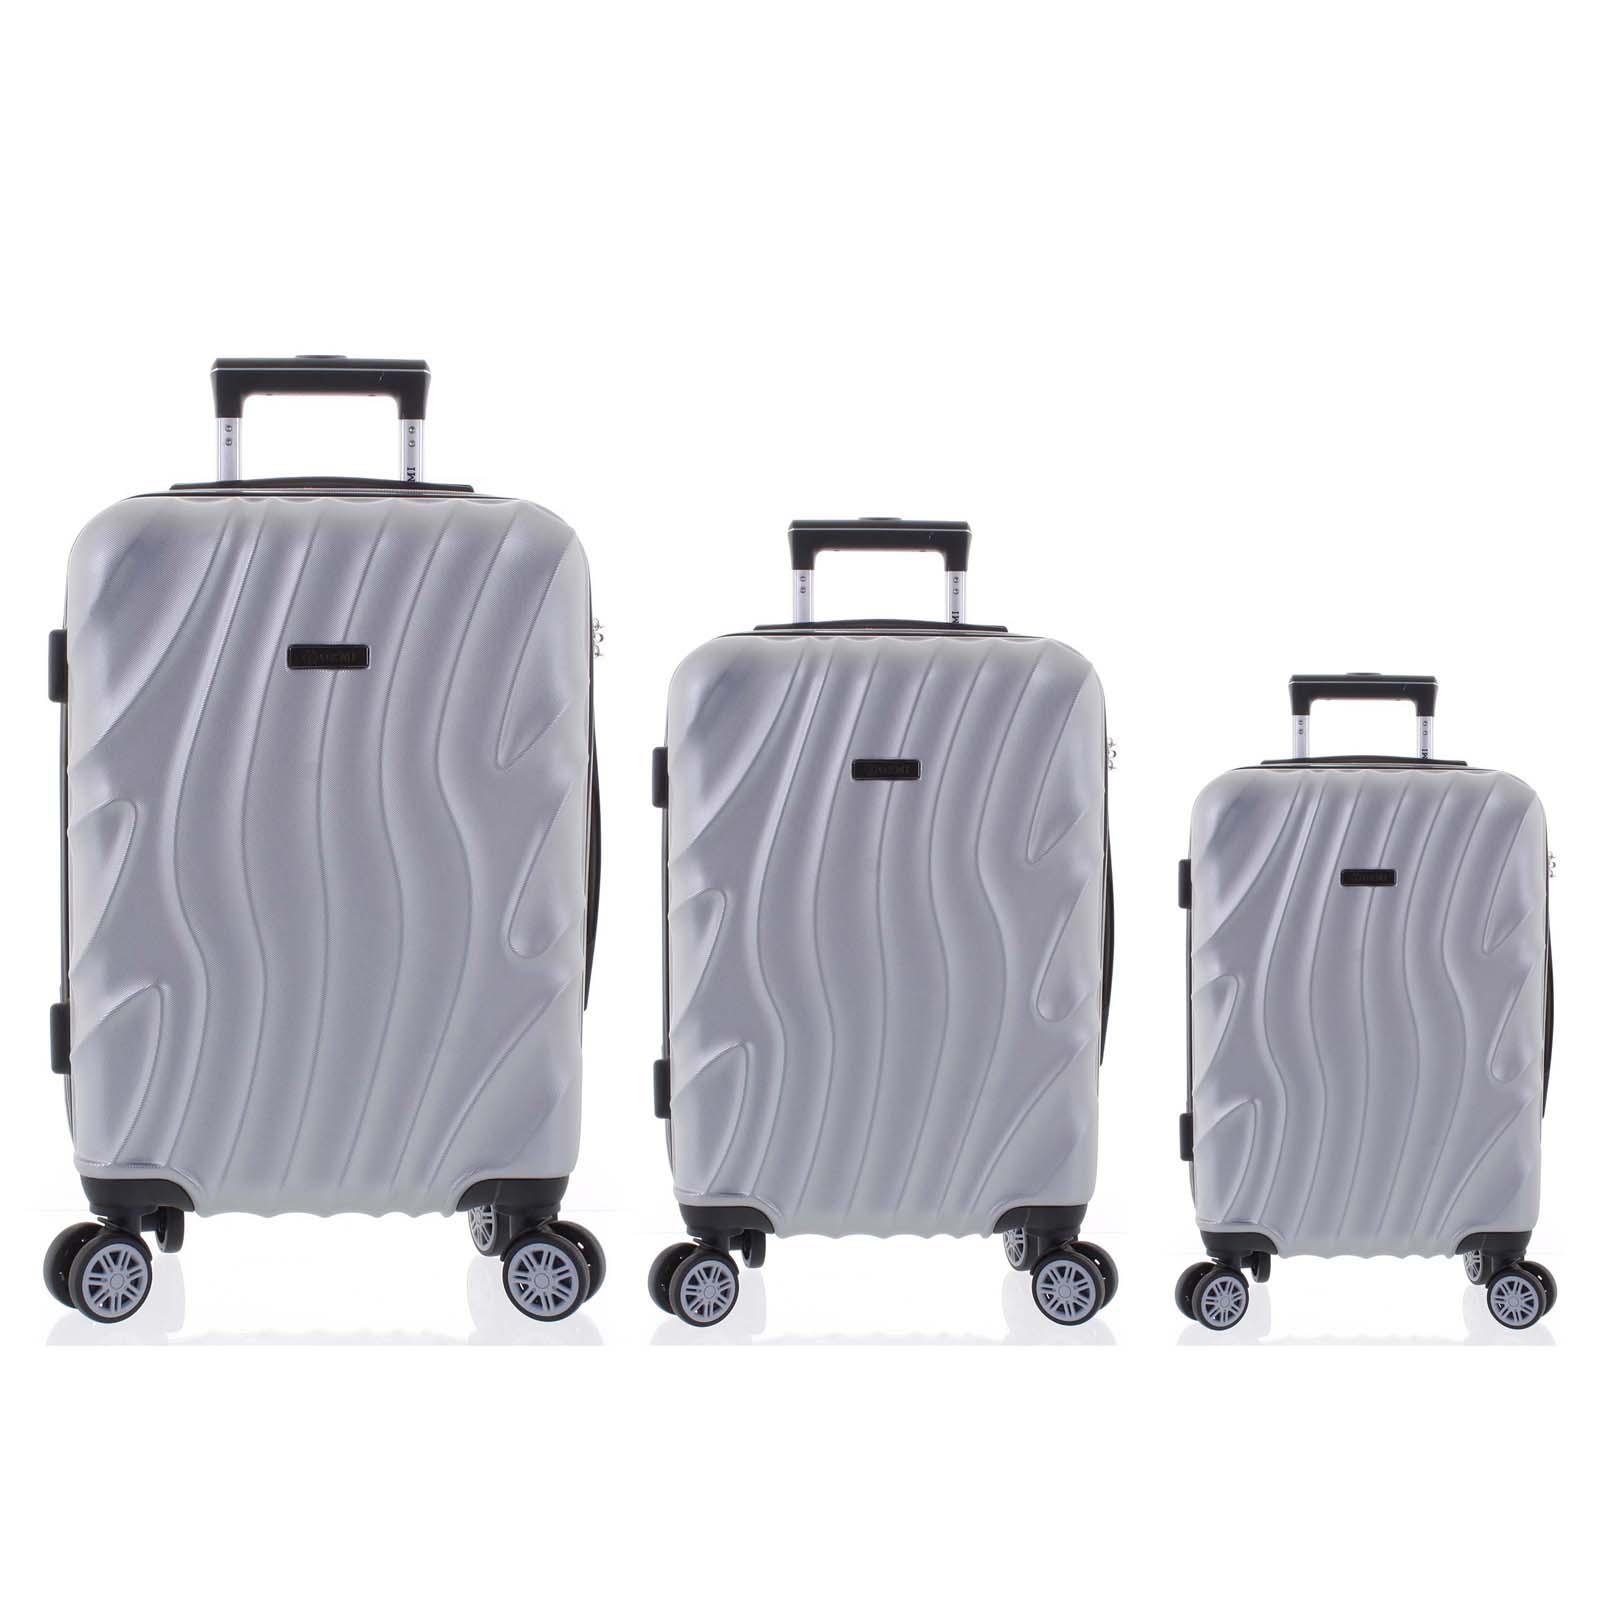 Pevný originální stříbrný cestovní kufr sada - Ormi Qadhifa L, M, S